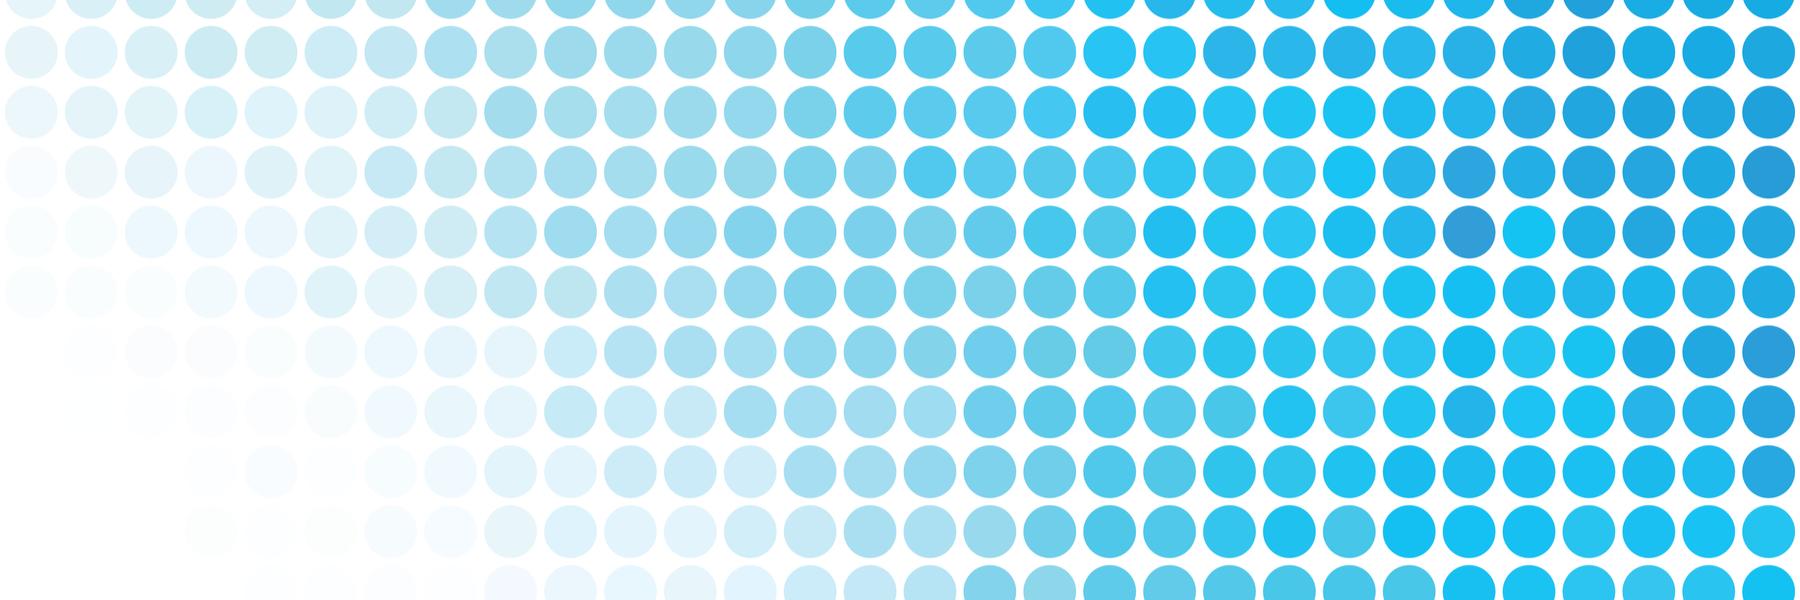 Pattern of blue dots.